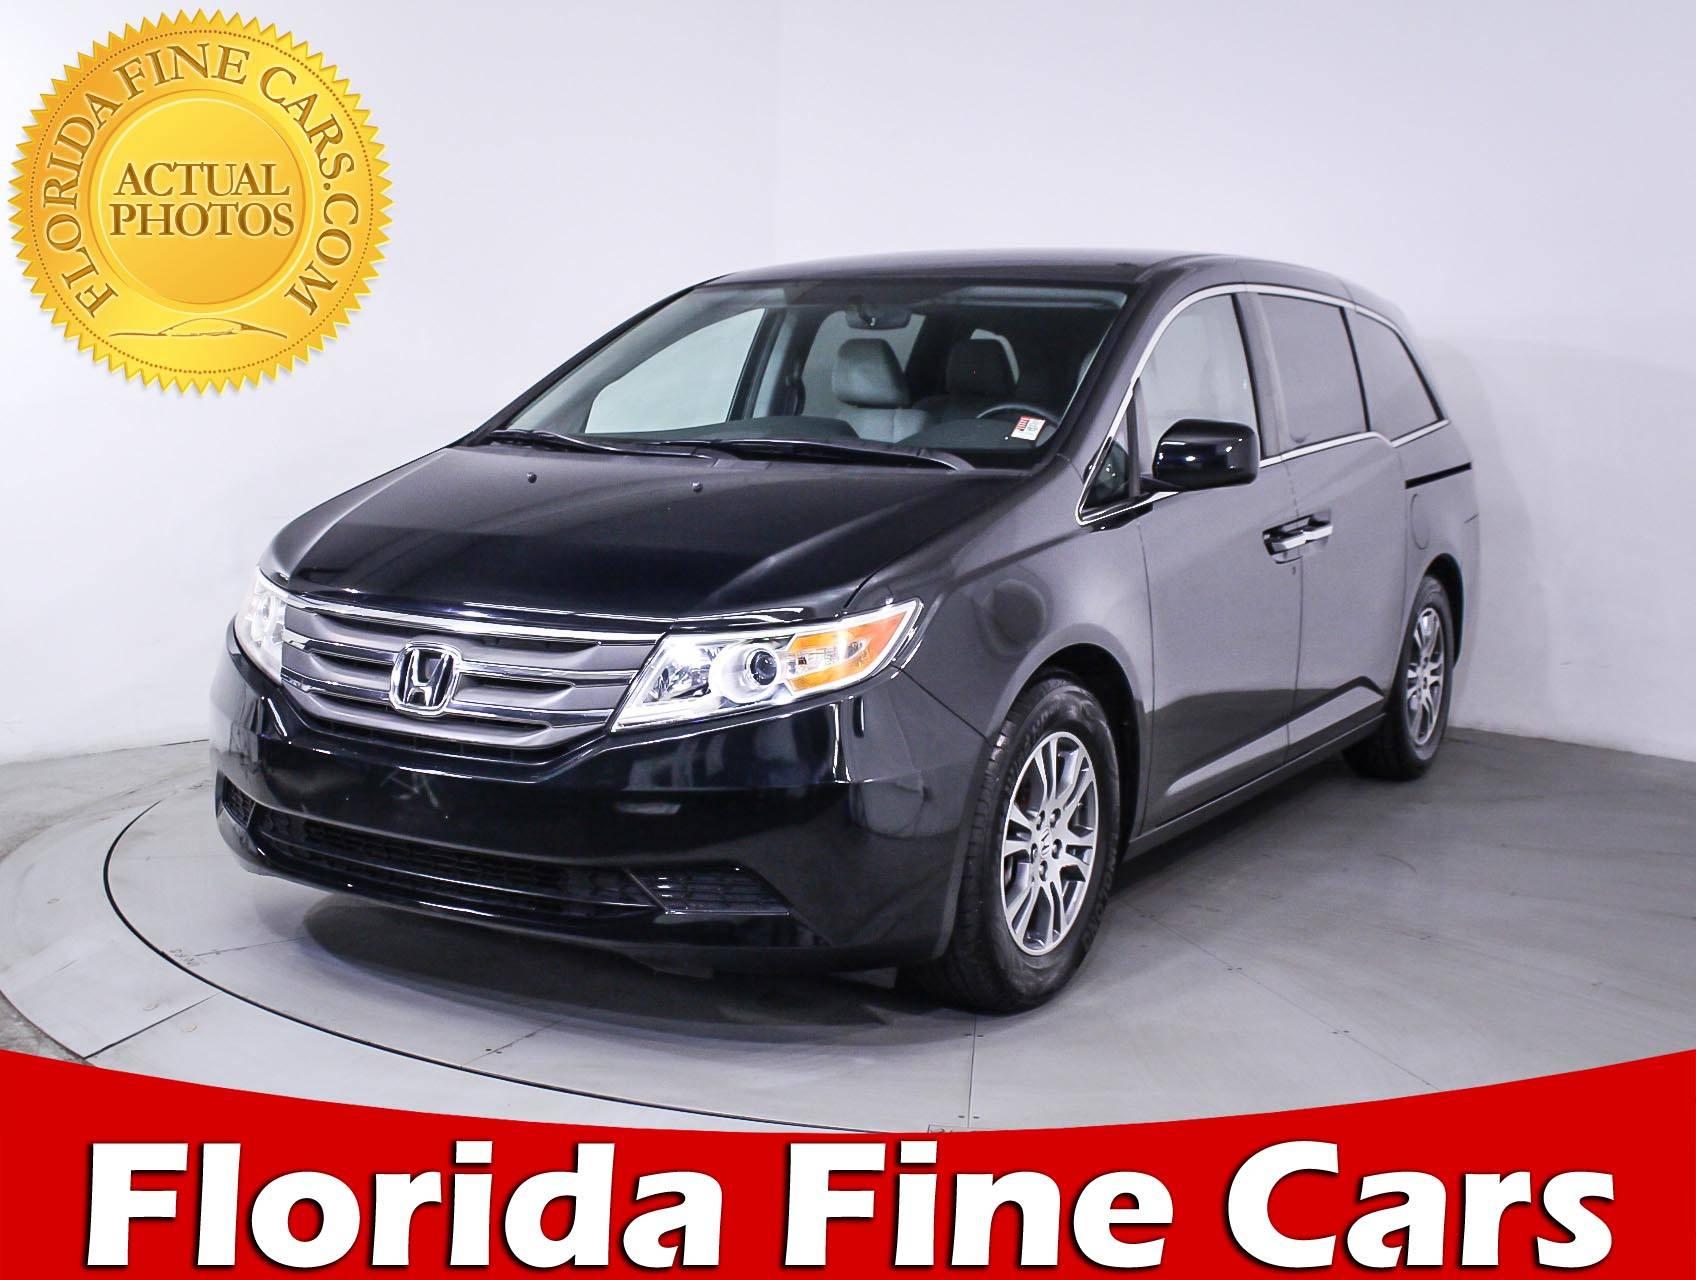 Used 2013 HONDA ODYSSEY EX Minivan for sale in MIAMI FL